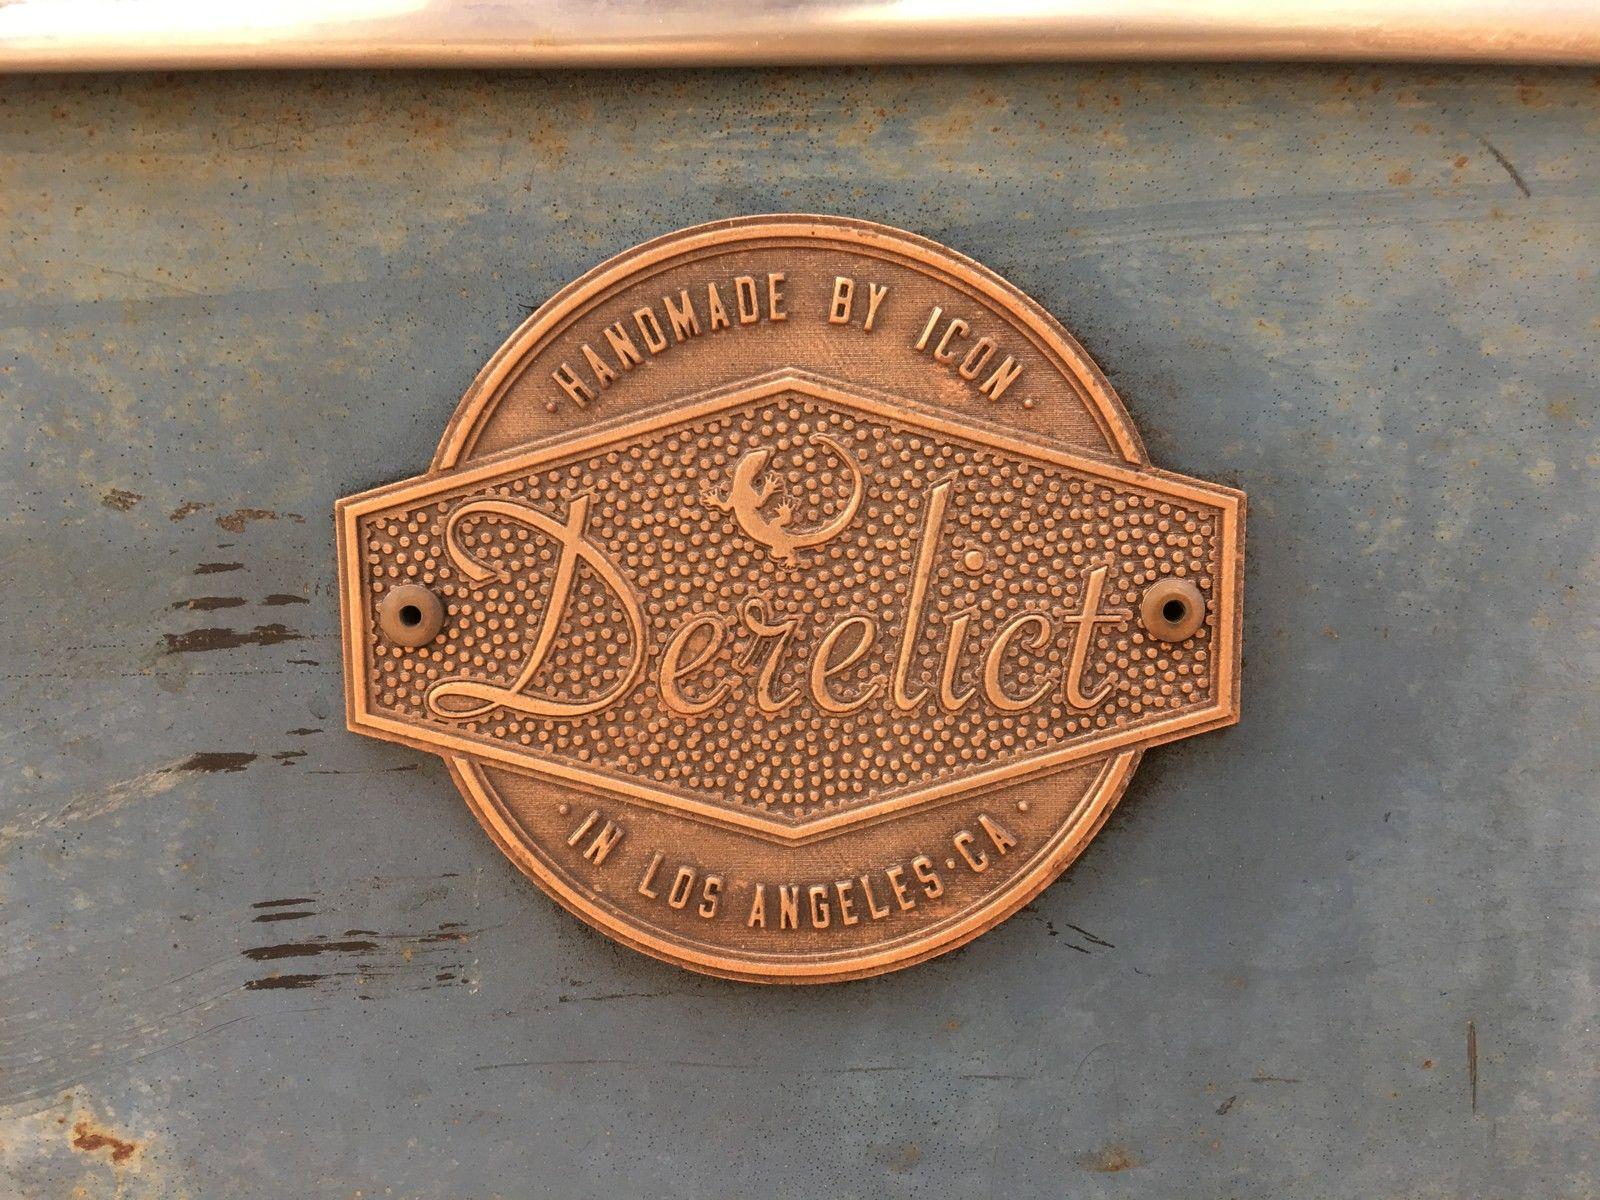 1950 Buick Roadmaster ICON Derelict badge detail